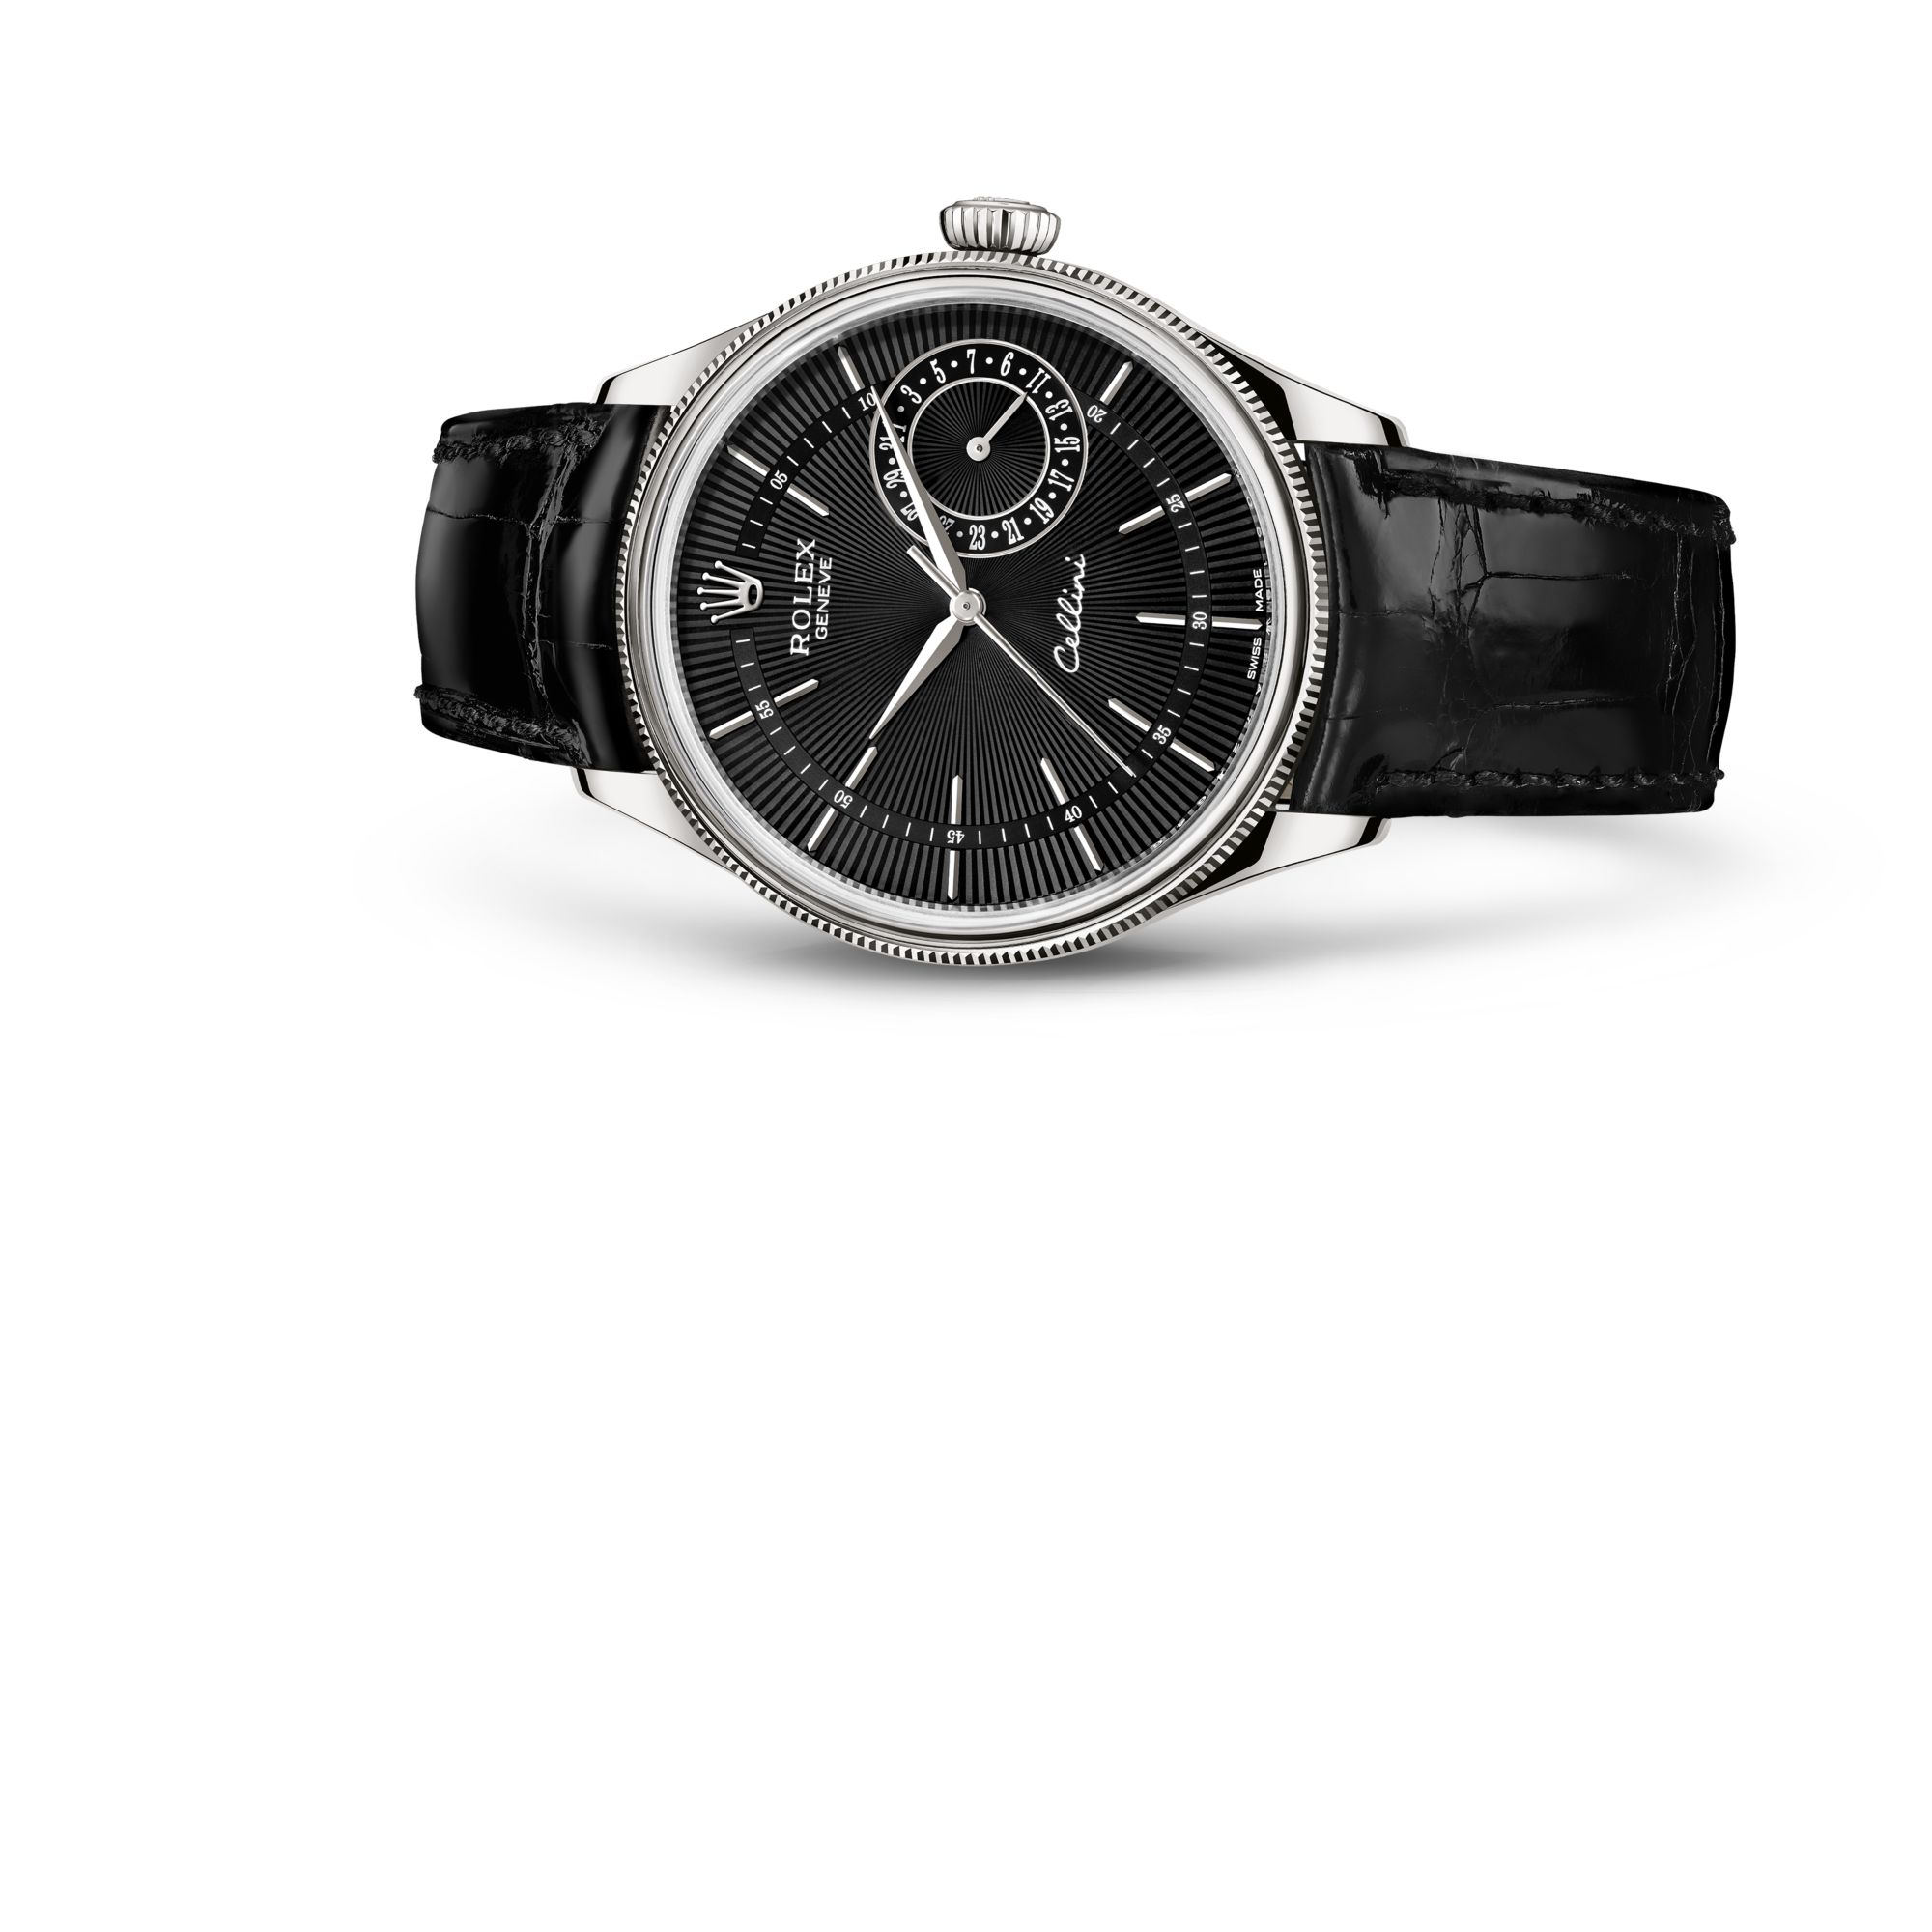 Rolex チェリーニ デイト M50519-0007